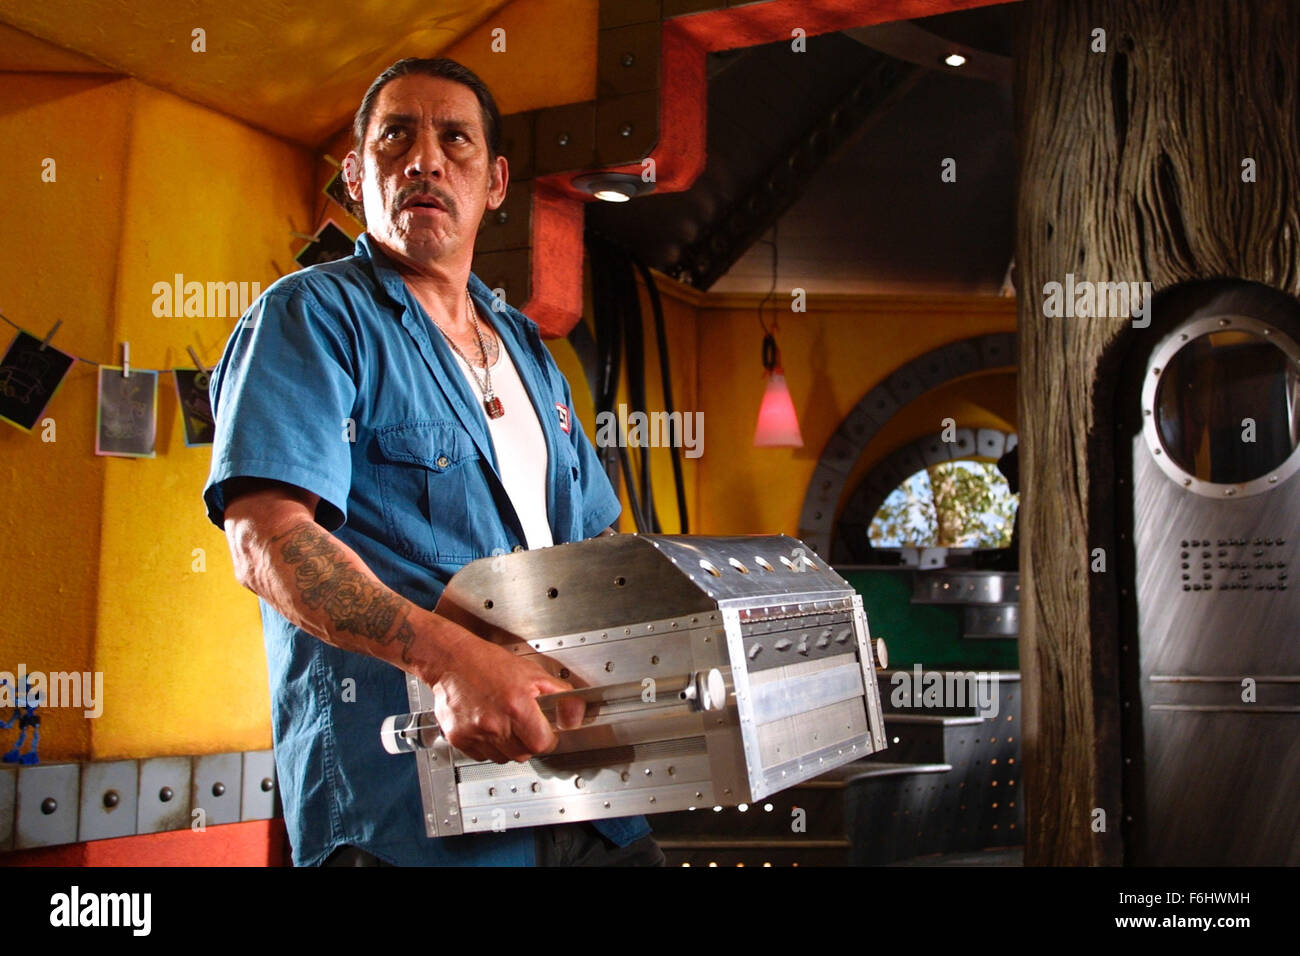 Jul 23, 2002; Hollywood, CA, USA; DANNY TREJO stars in 'Spy Kids 2: The Island of Lost Dreams.'.  (Credit Image: Stock Photo